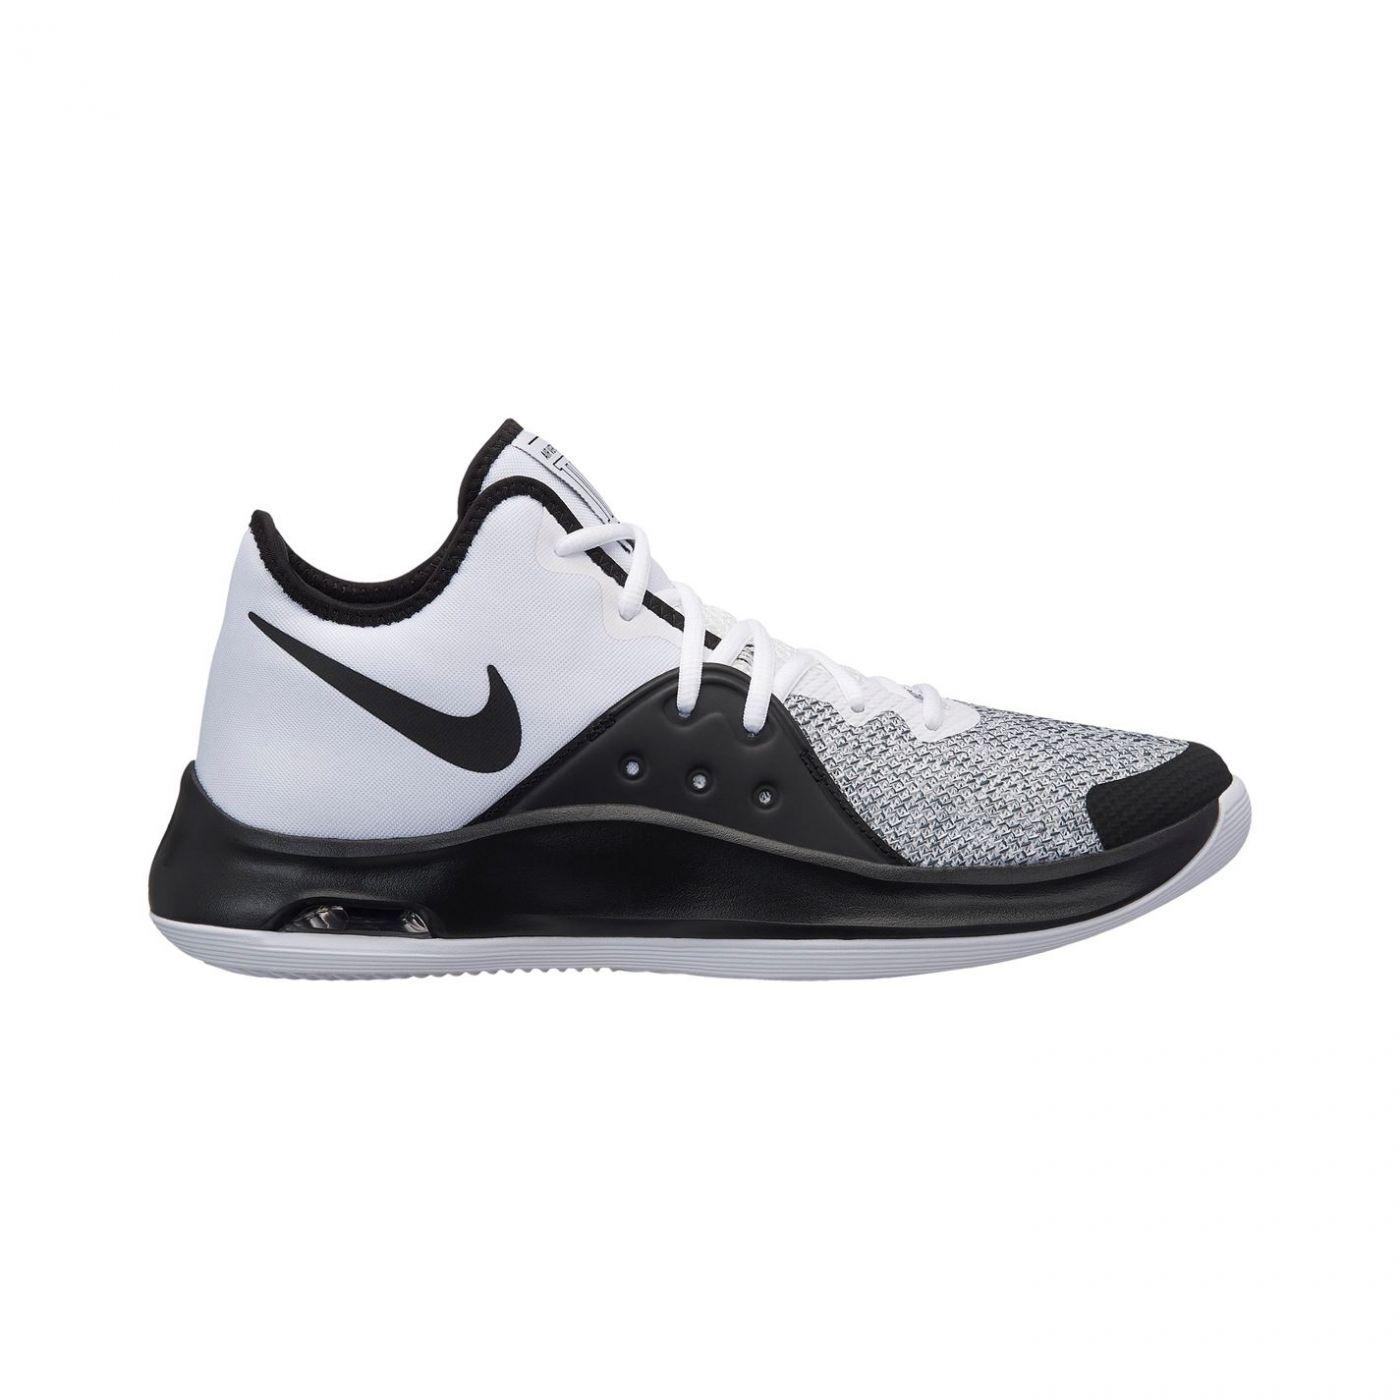 Men's basketball shoes Nike Air Versitile III